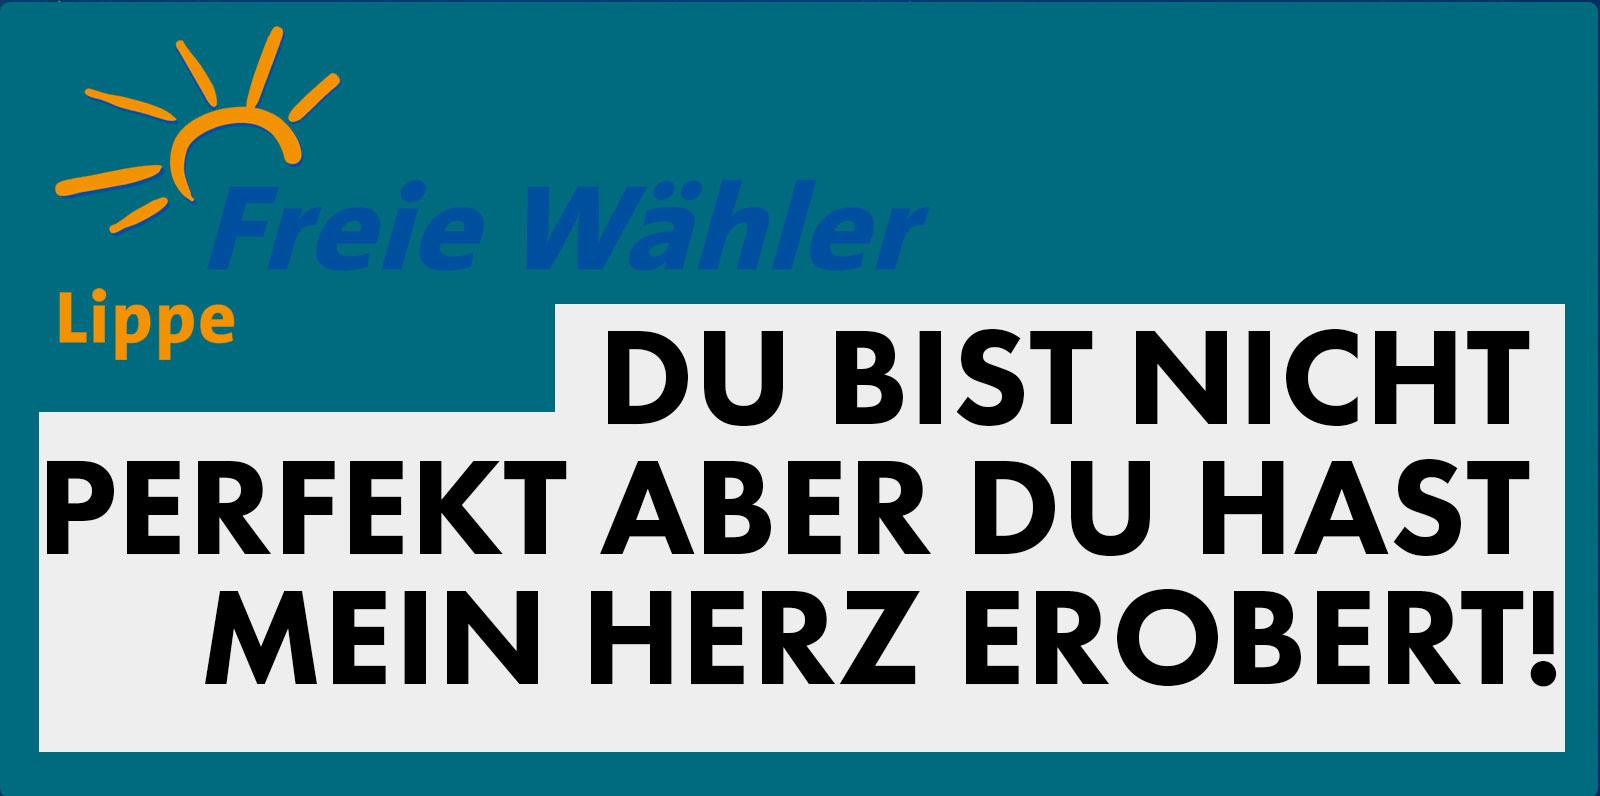 FWHerzerobert